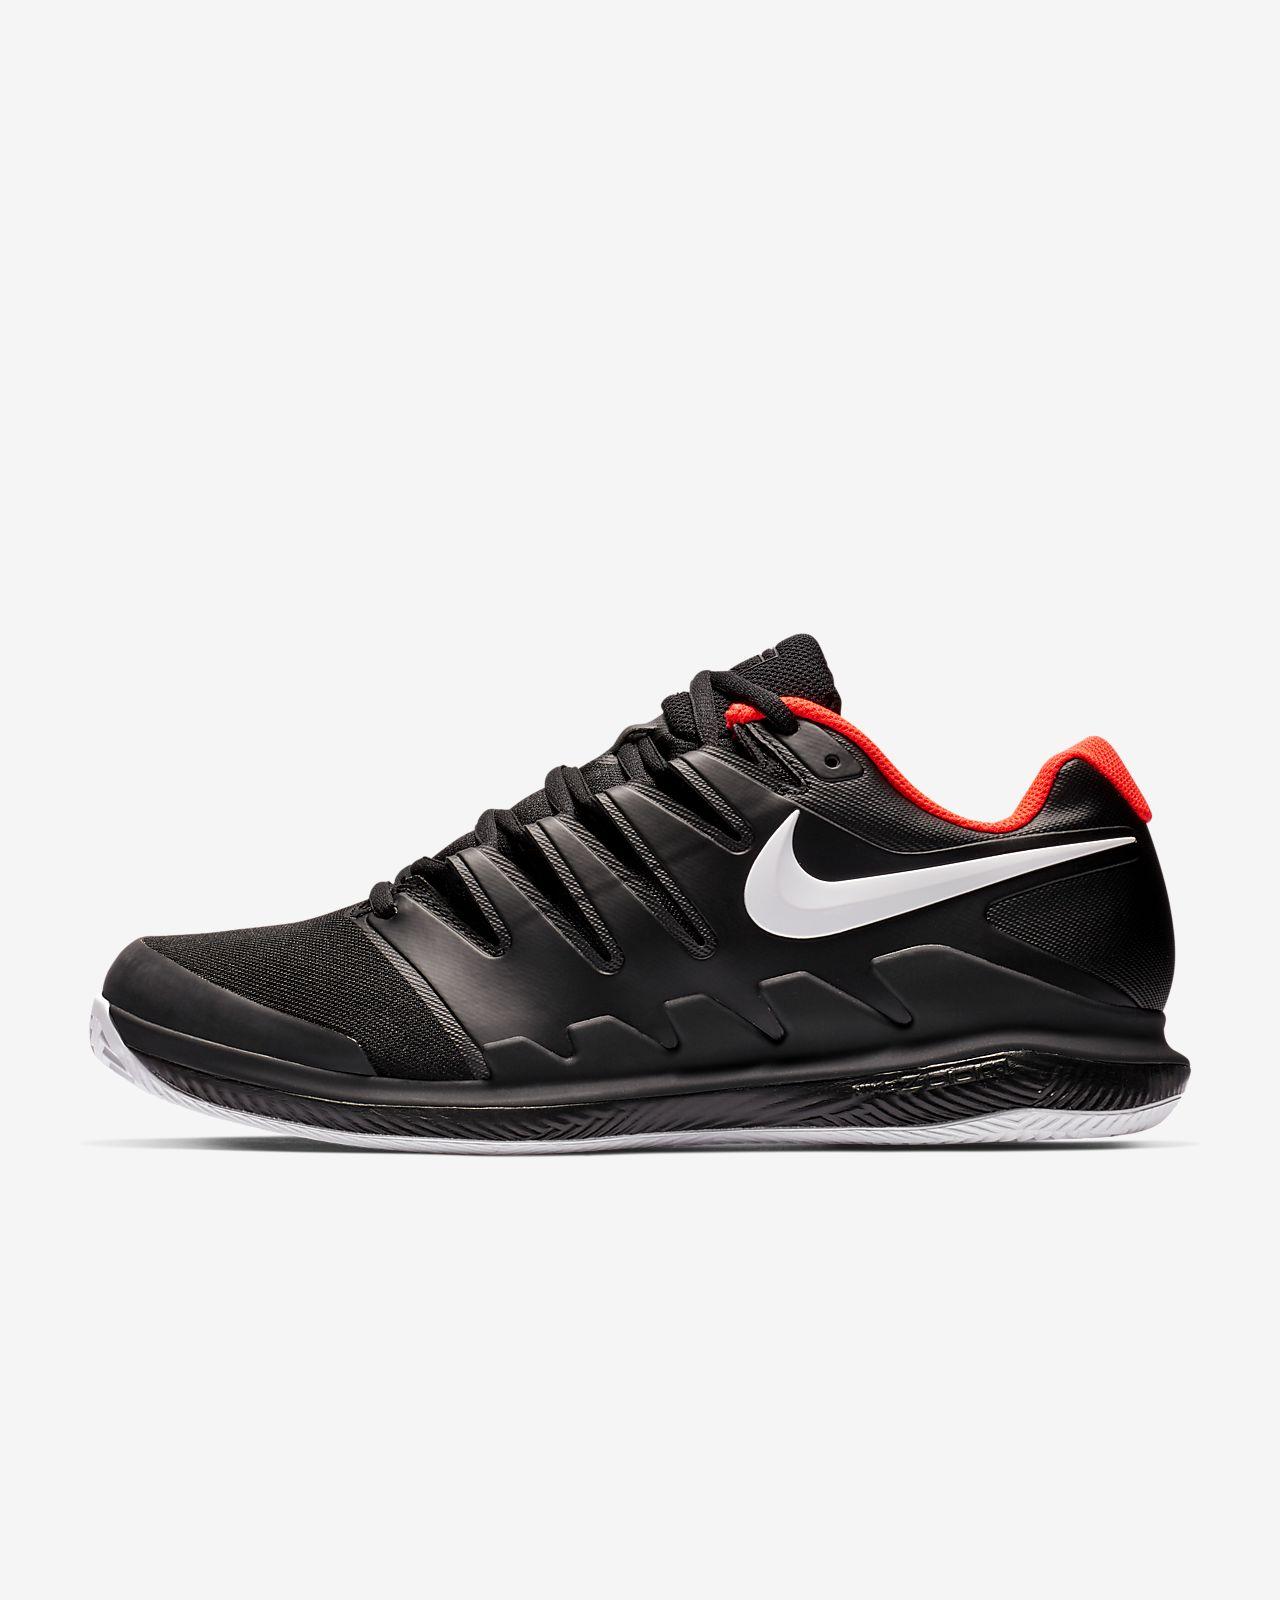 X Clay Zoom Hombre De Para Mx Calzado Tenis Nike Vapor Air 81wZUz